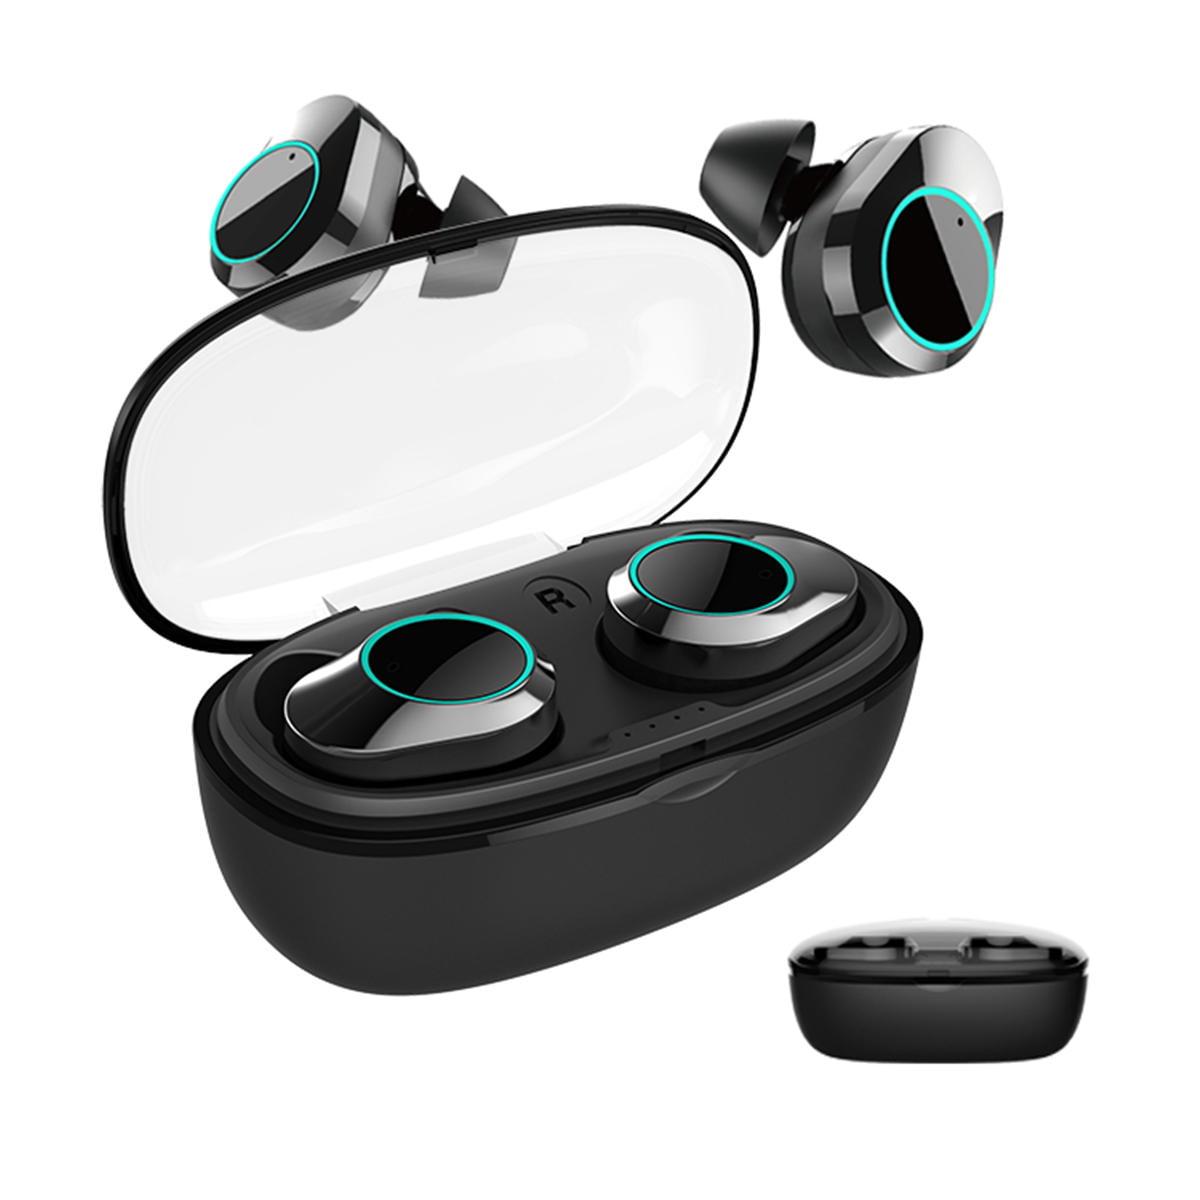 T2C TWS Bluetooth 5.0 earphone hifi stereo type-c charging case wholesale china 1 (13)